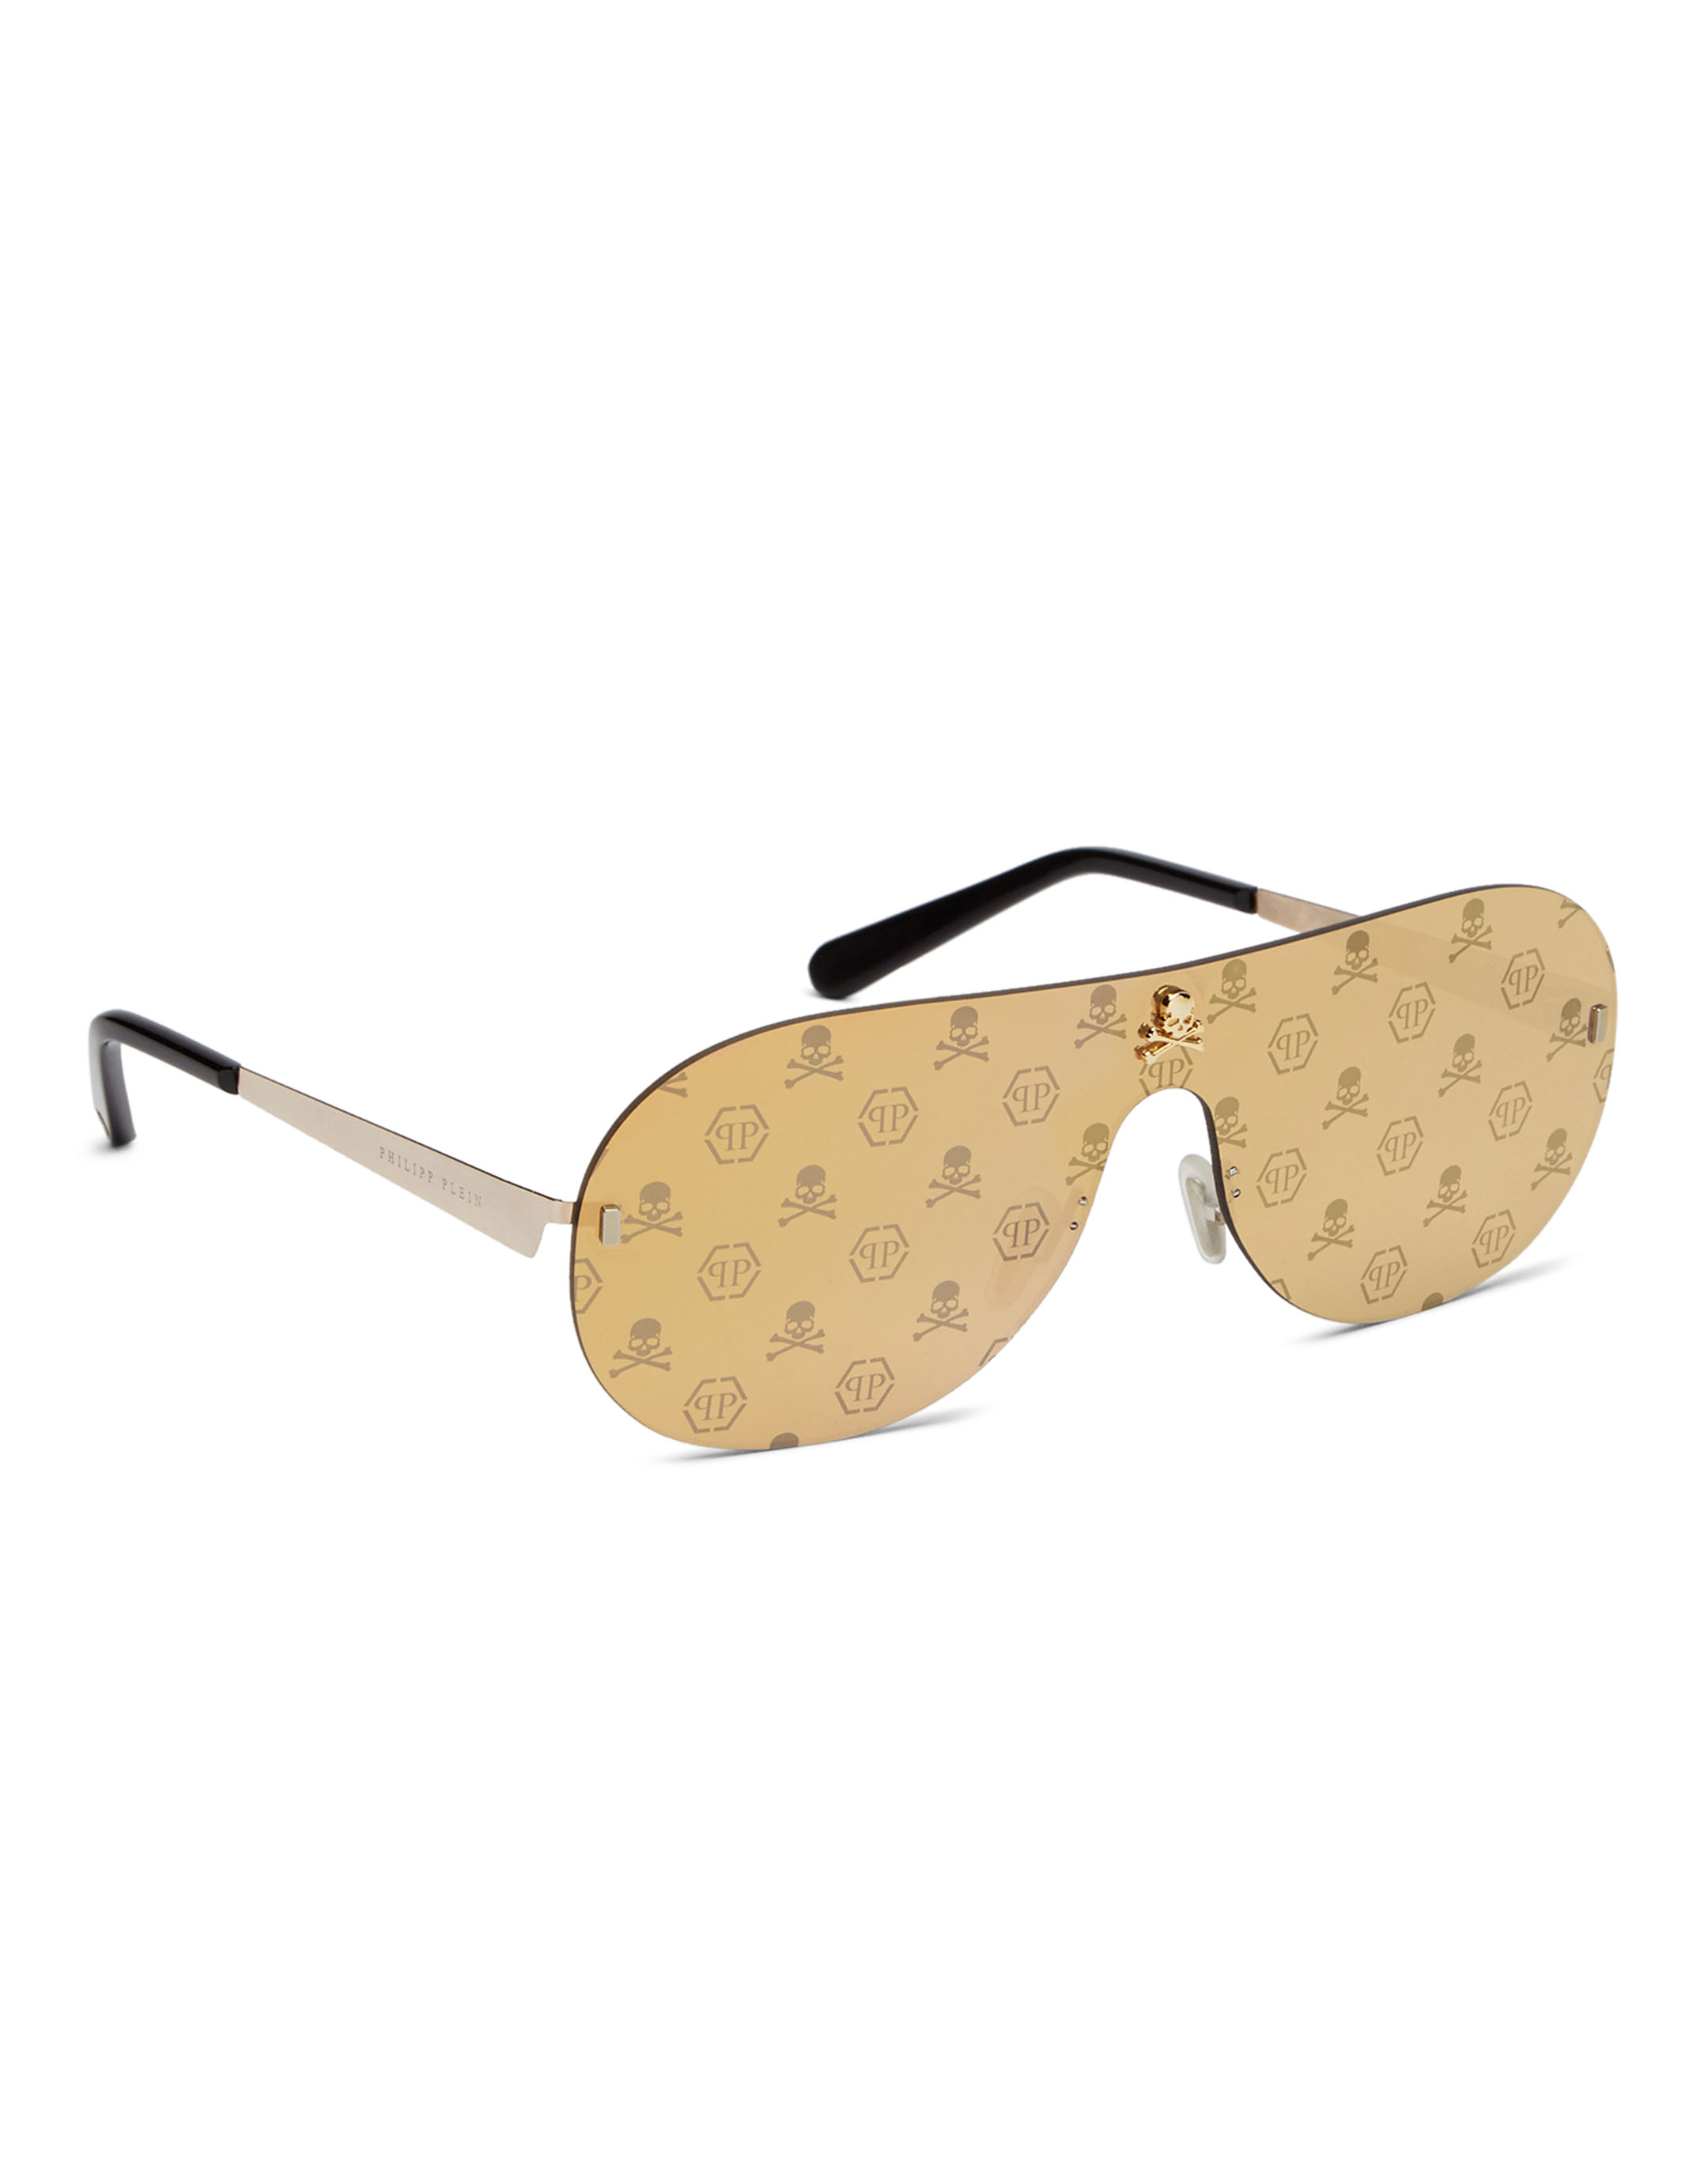 f9eff42645e78 Sunglasses Target Monogram